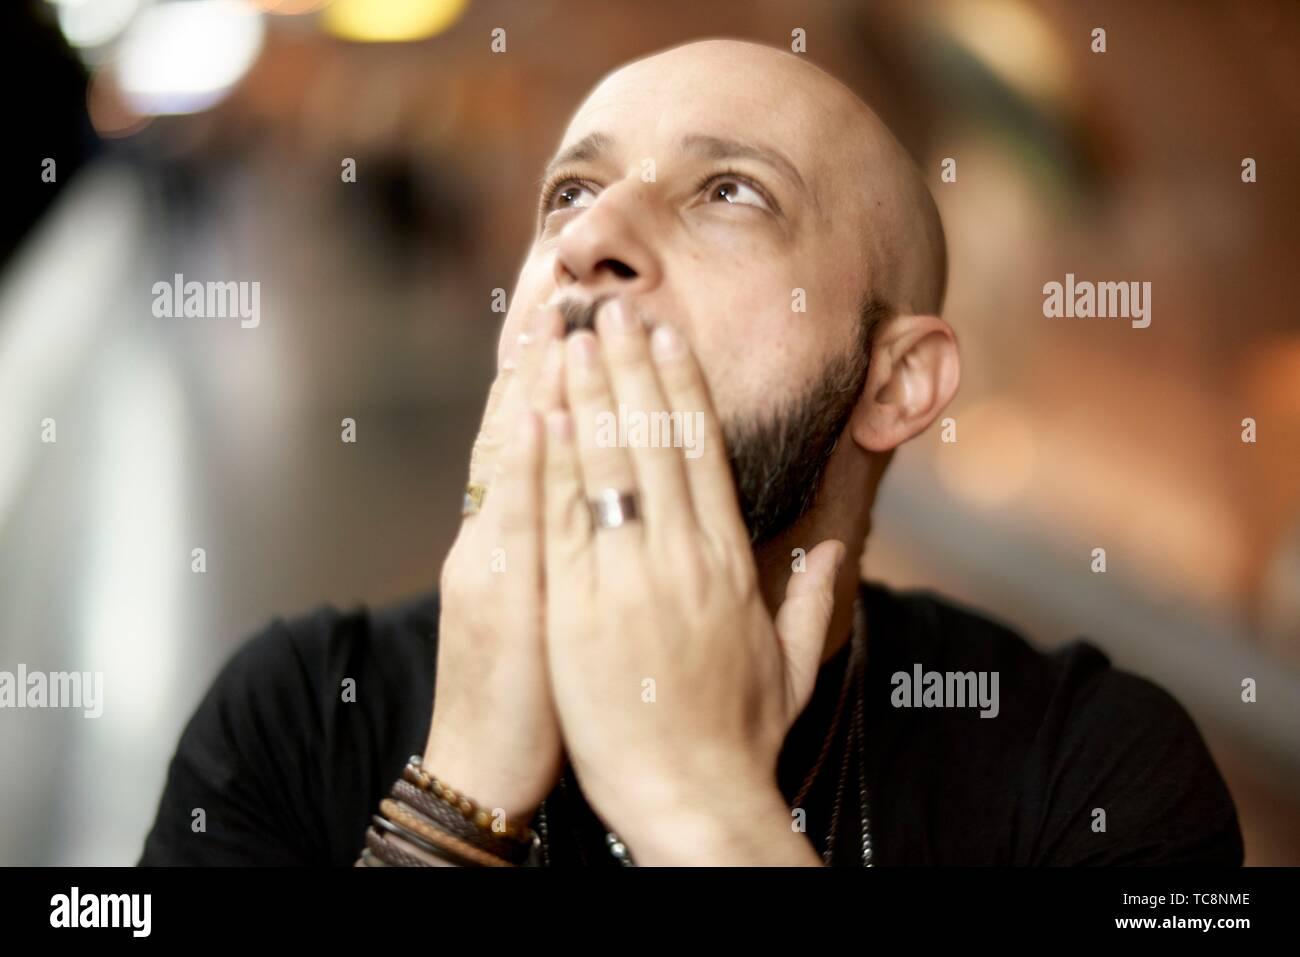 man in Paris, France Stock Photo